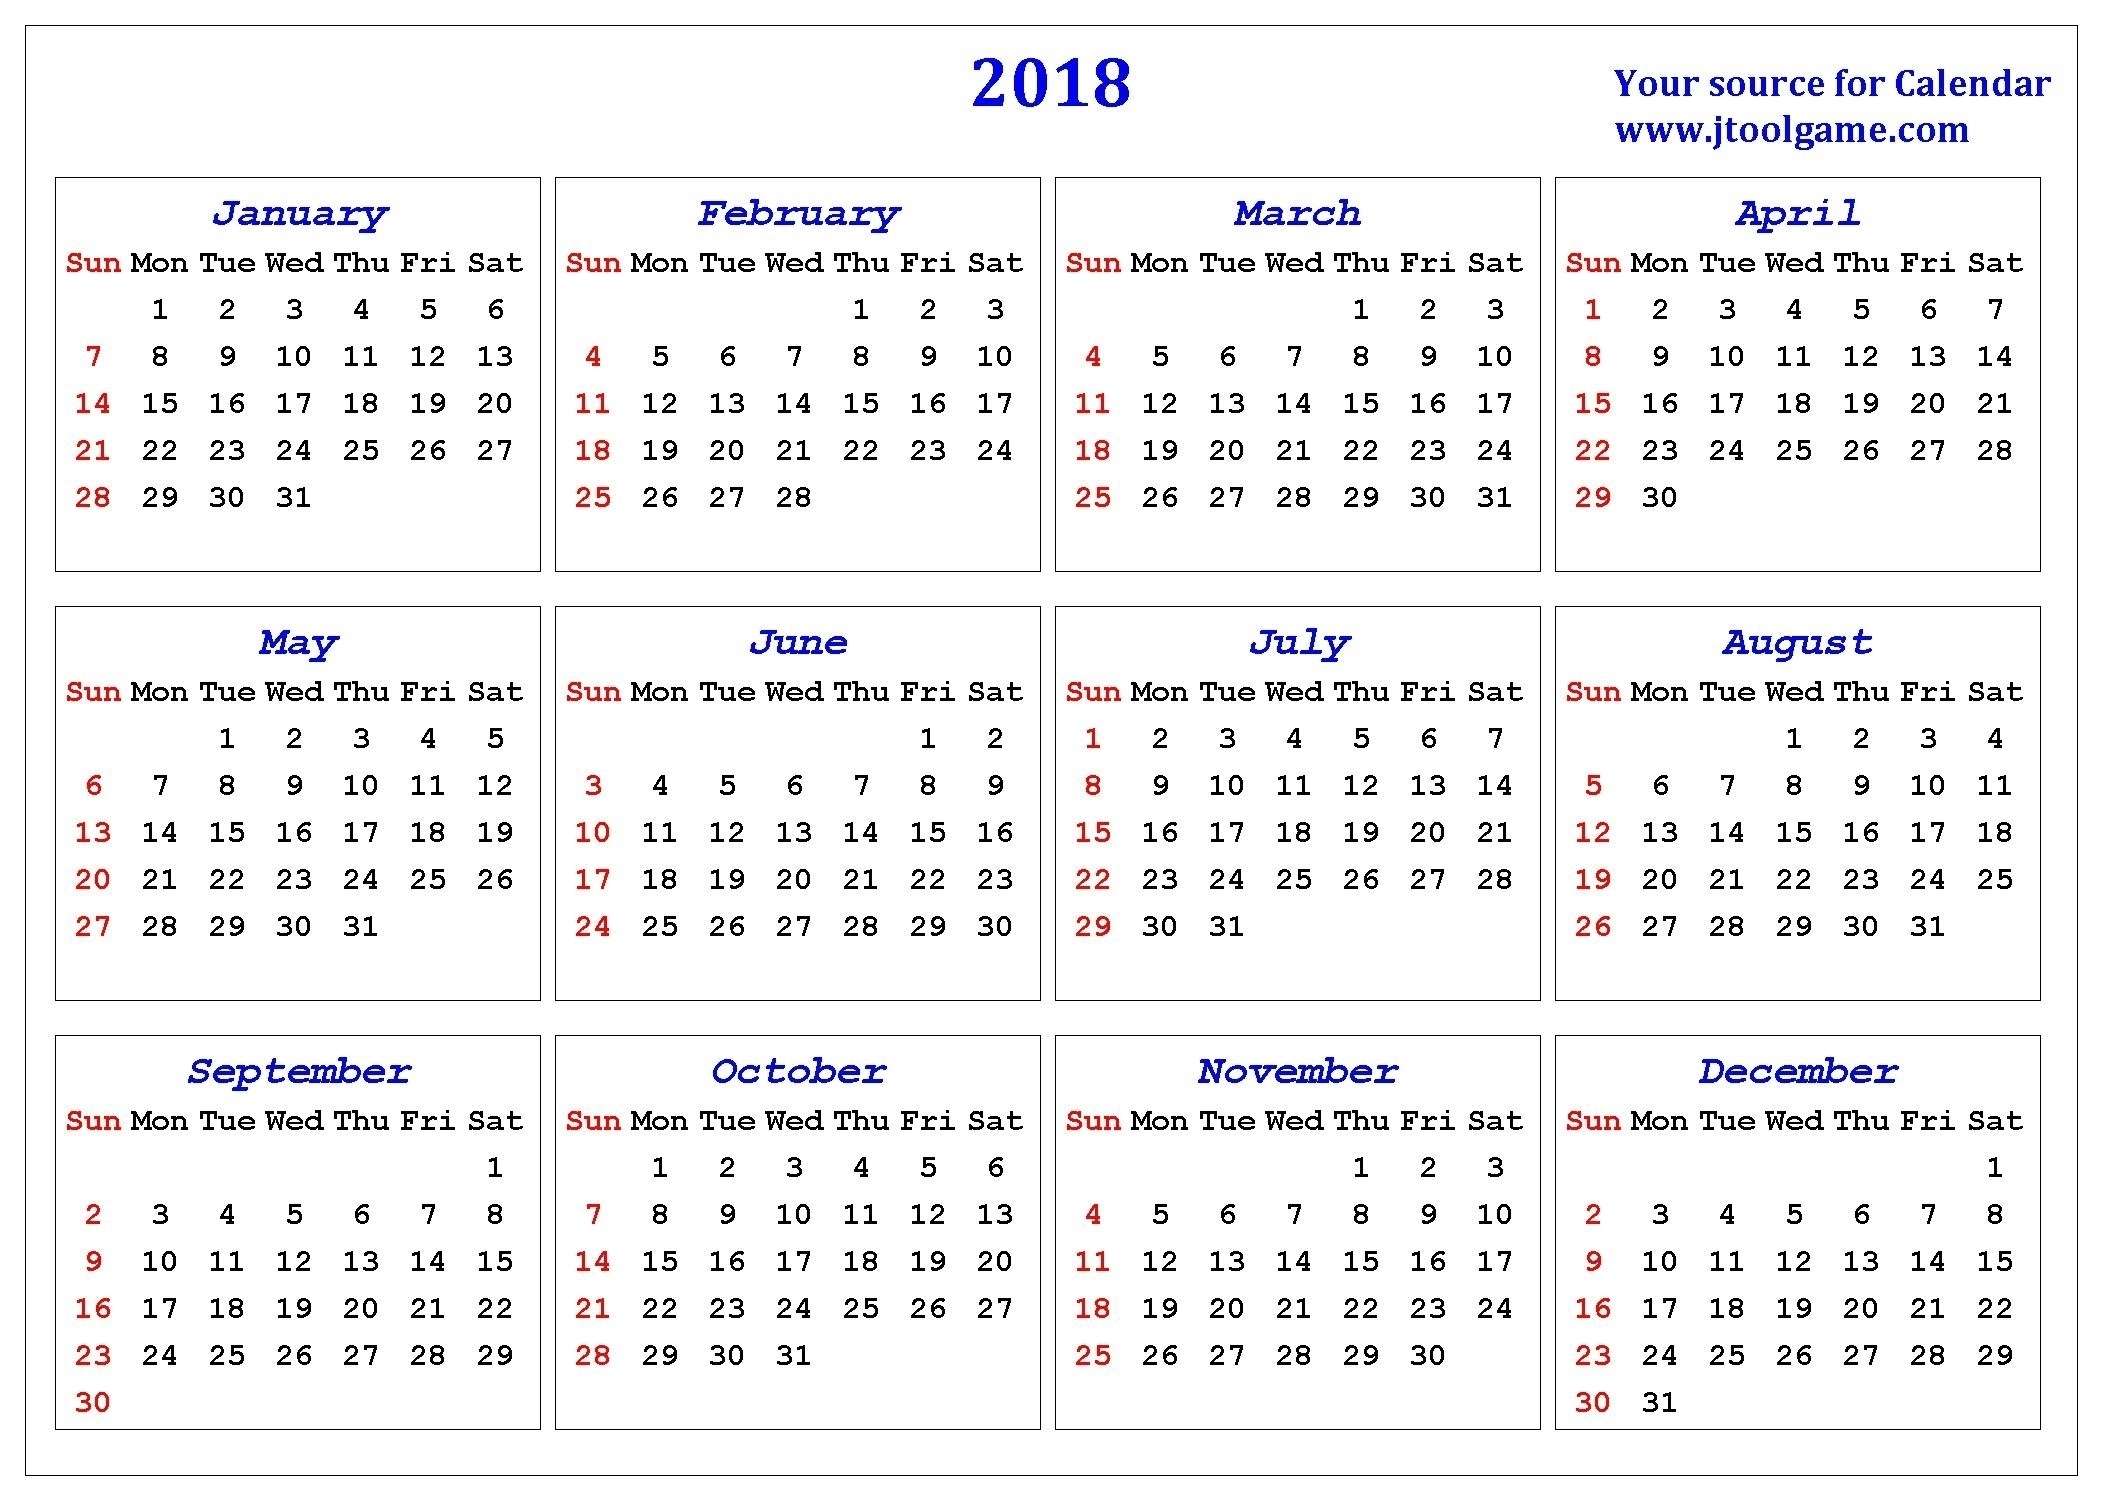 Calendar News Last Week   Igotlockedout